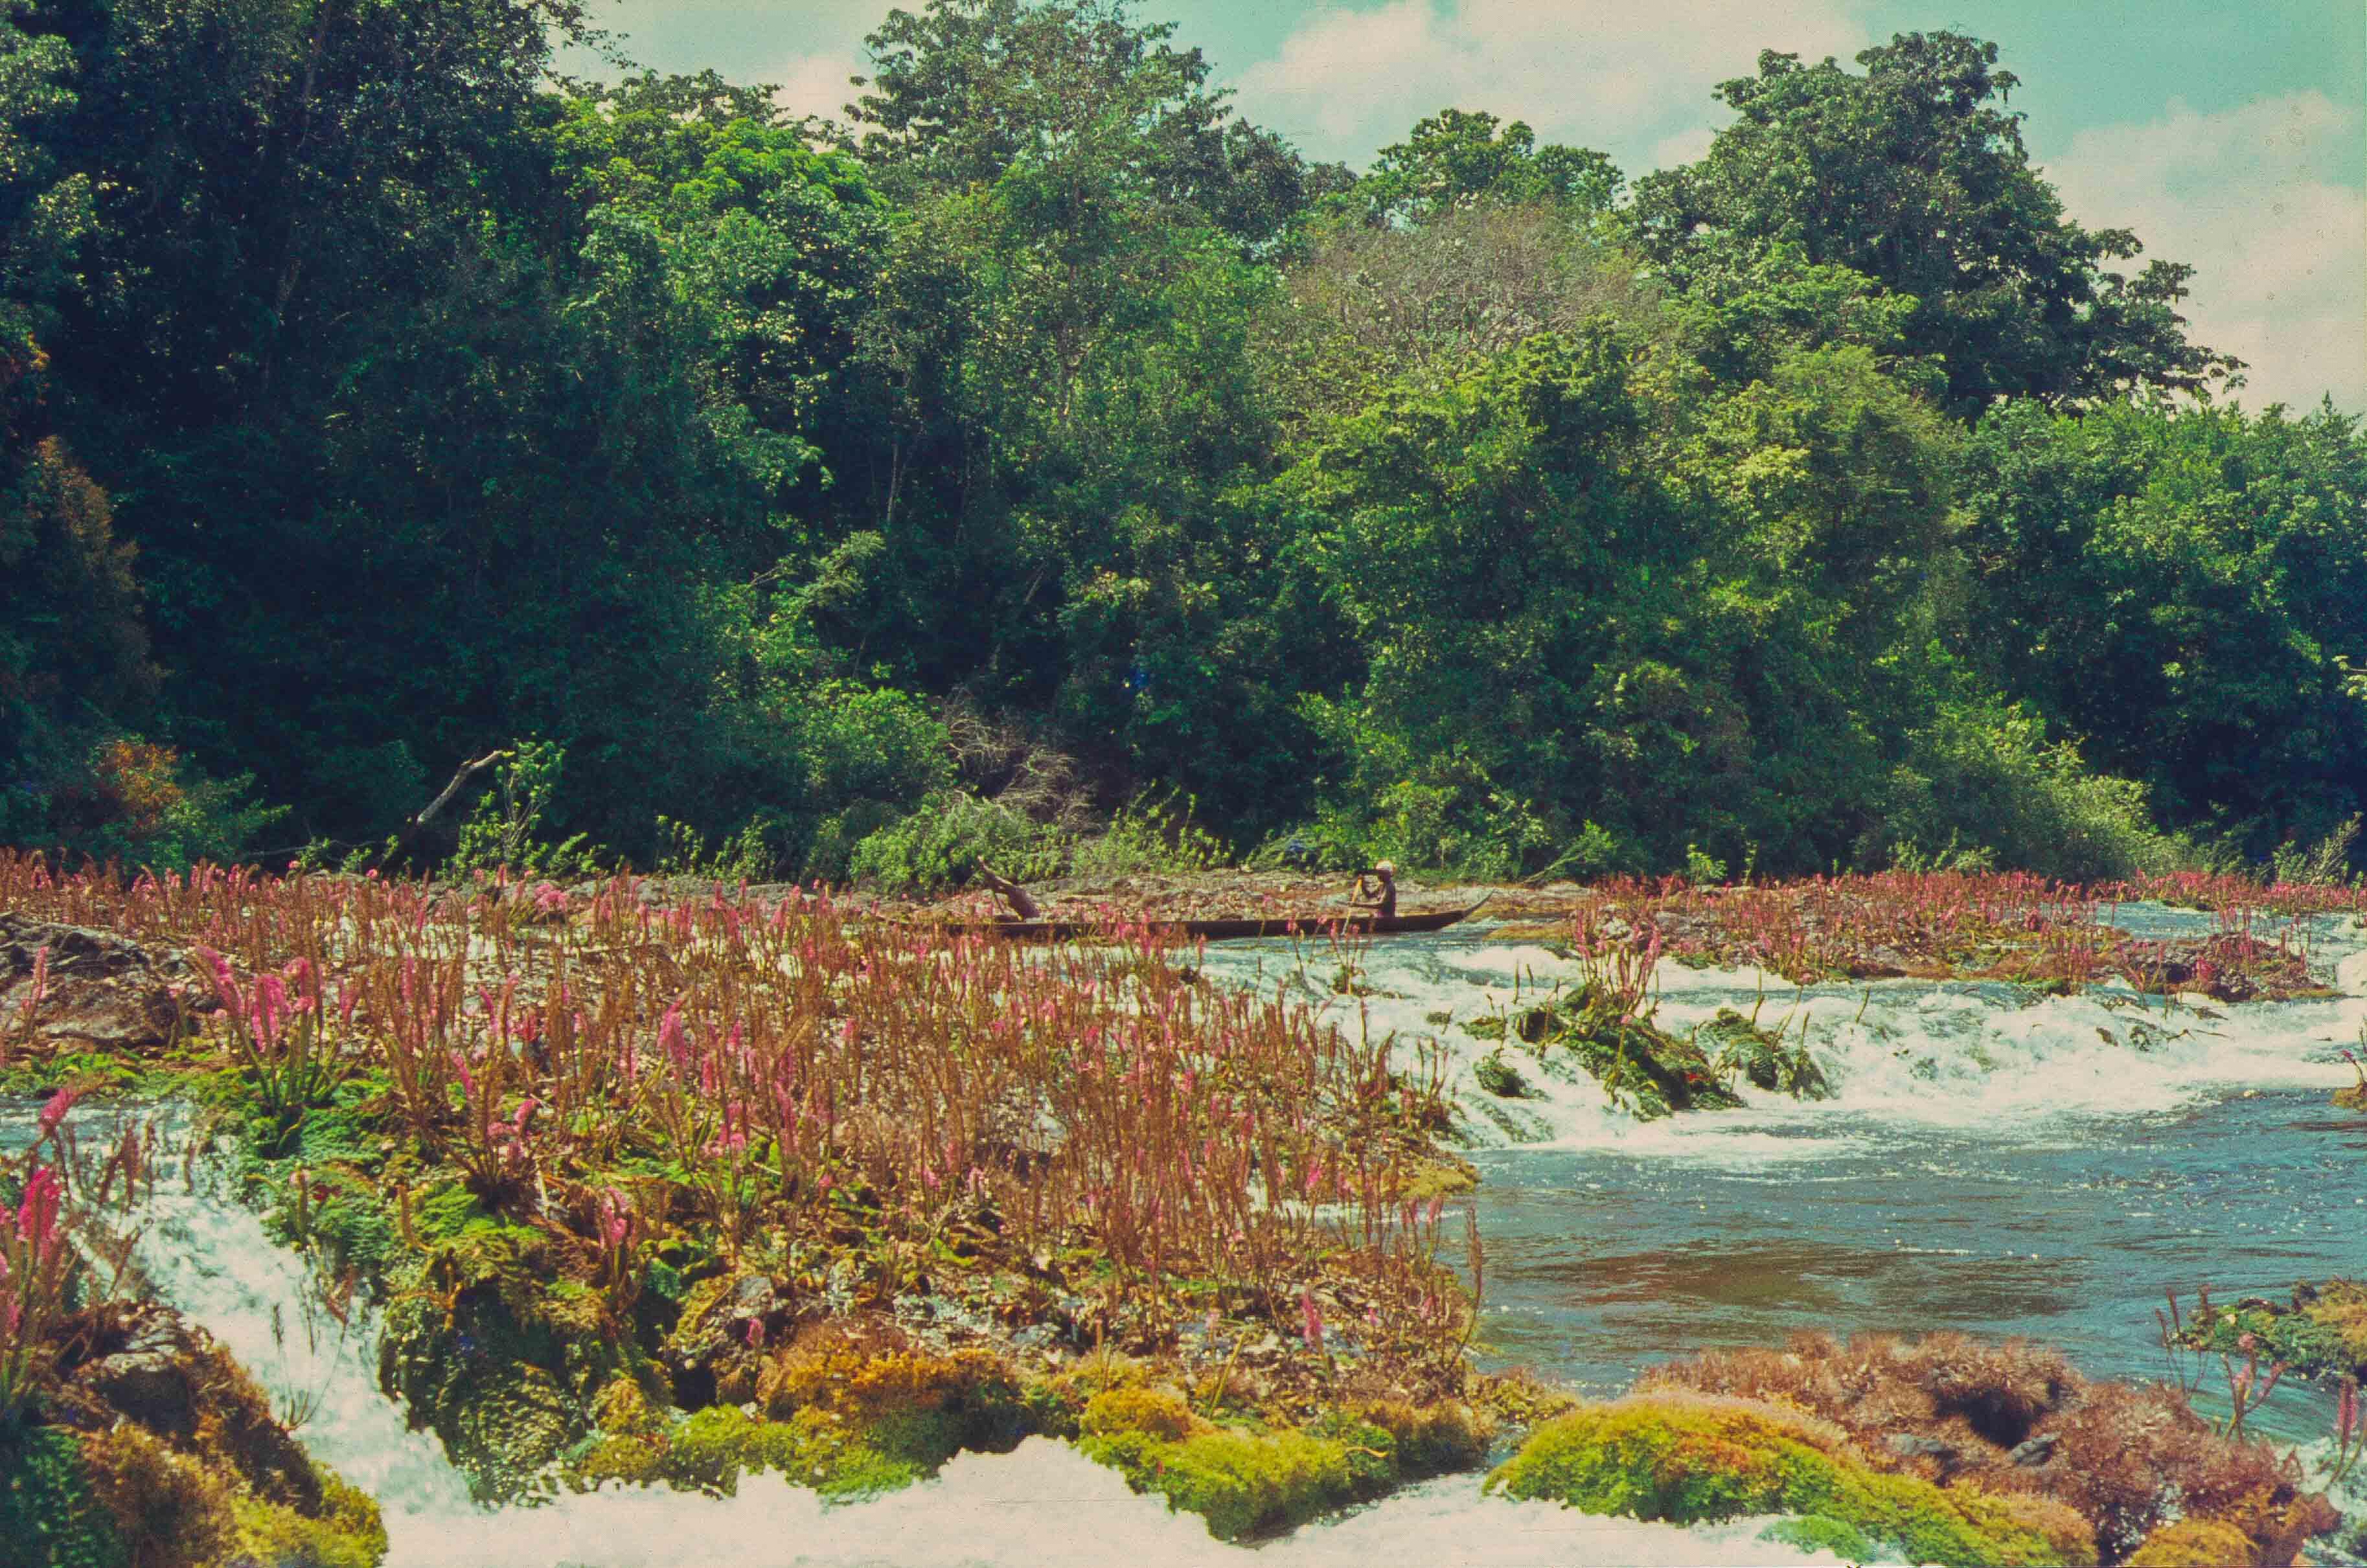 471. Suriname